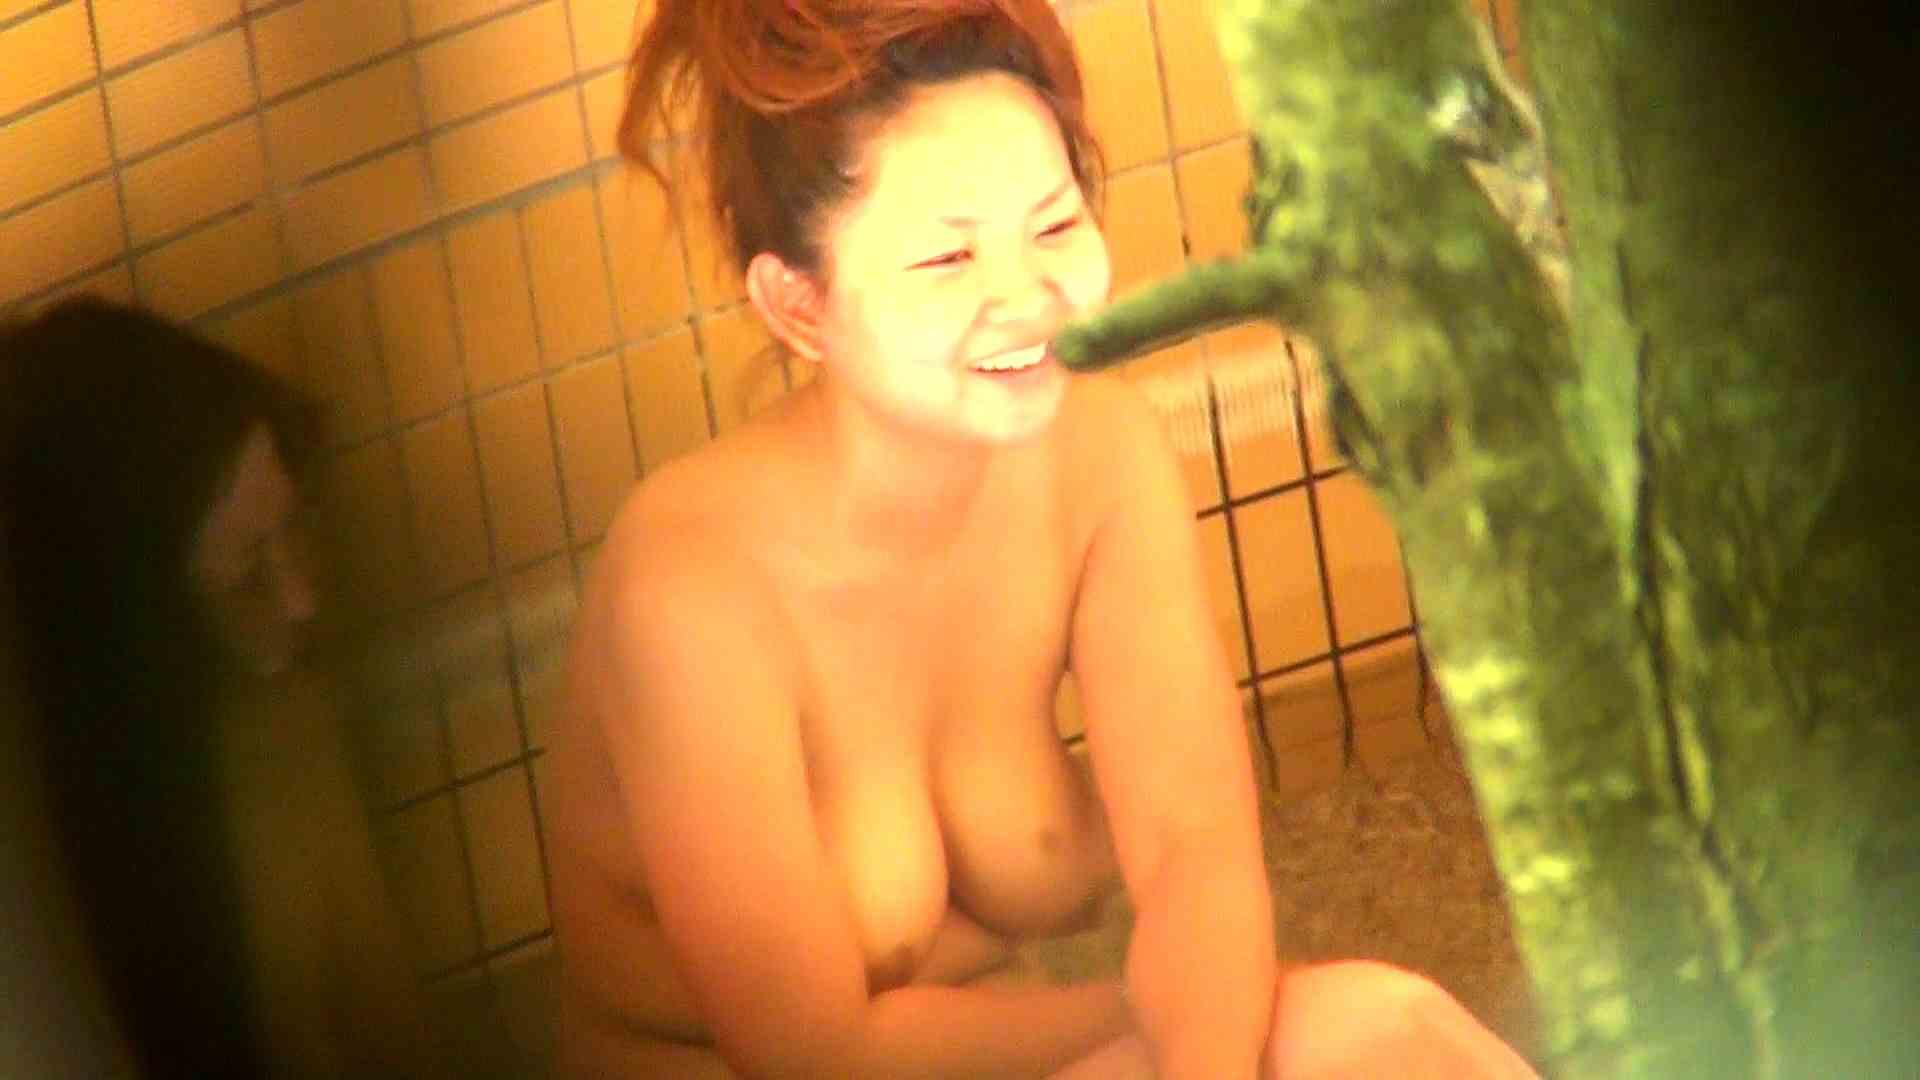 Aquaな露天風呂Vol.267 盗撮   HなOL  91pic 78